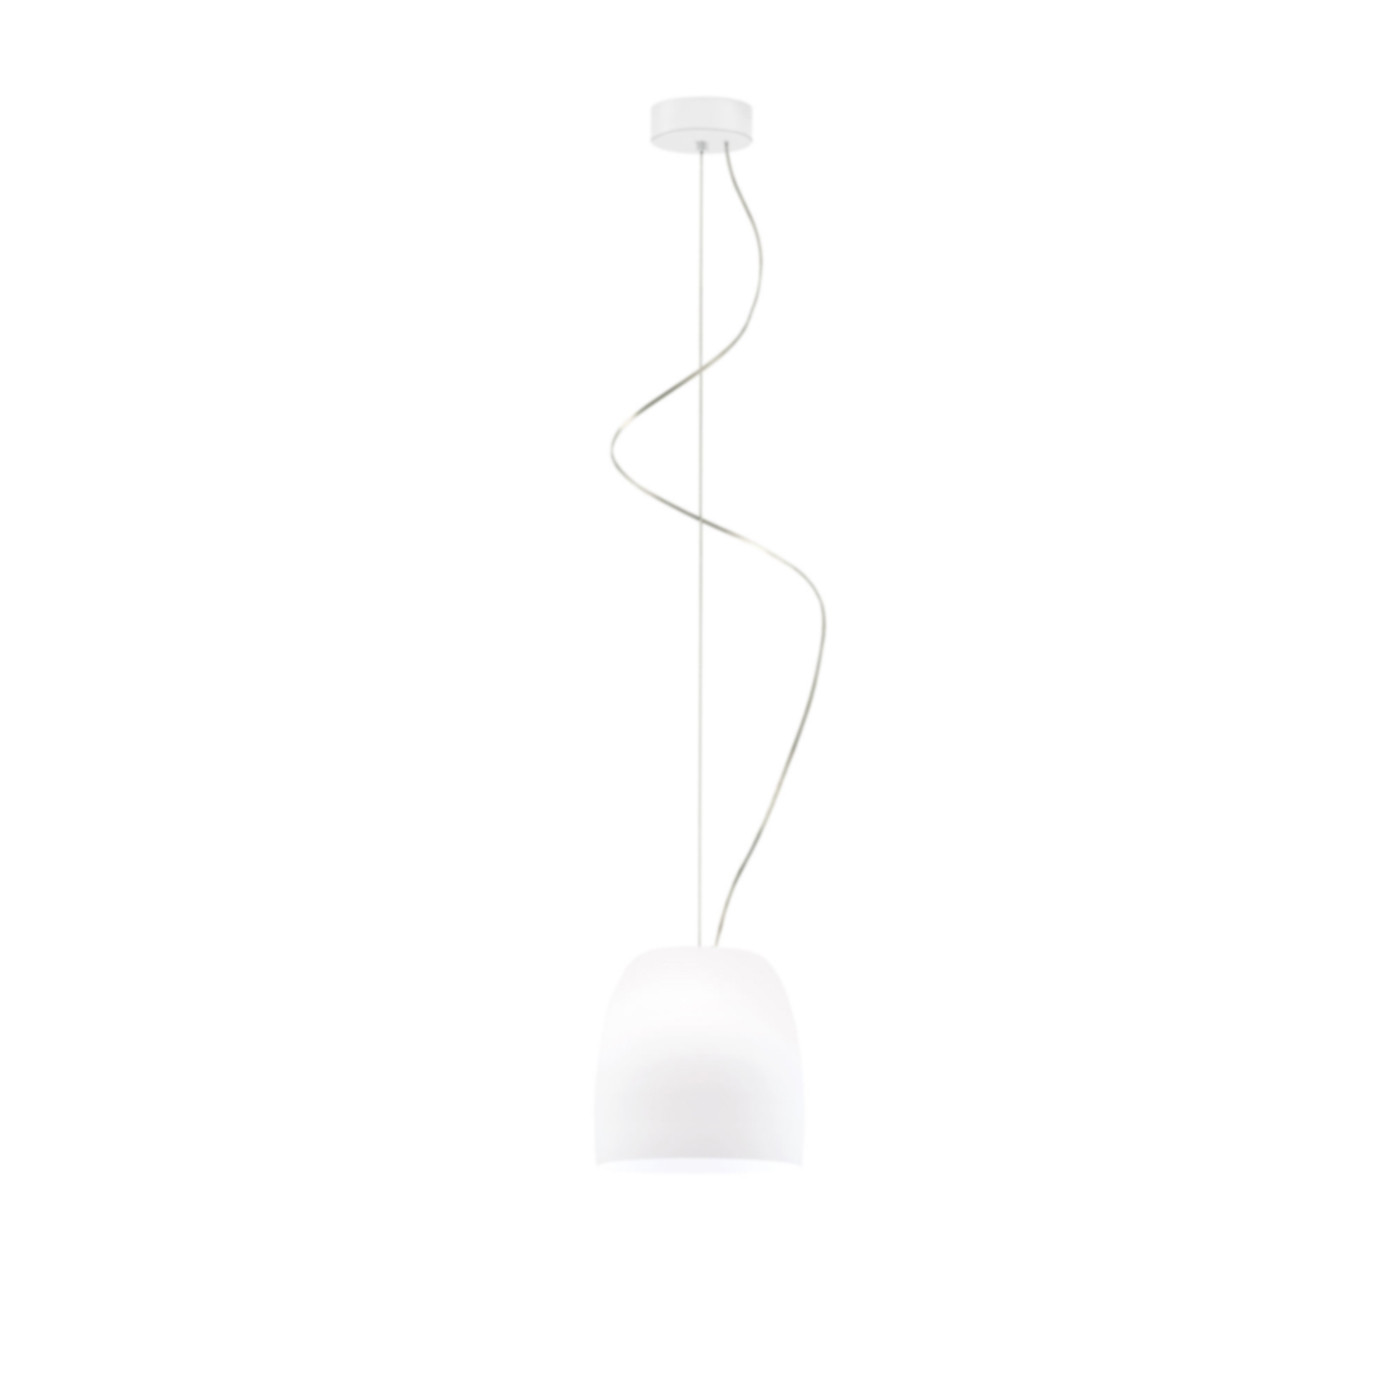 Prandina Notte S1 Glas LED Pendelleuchte